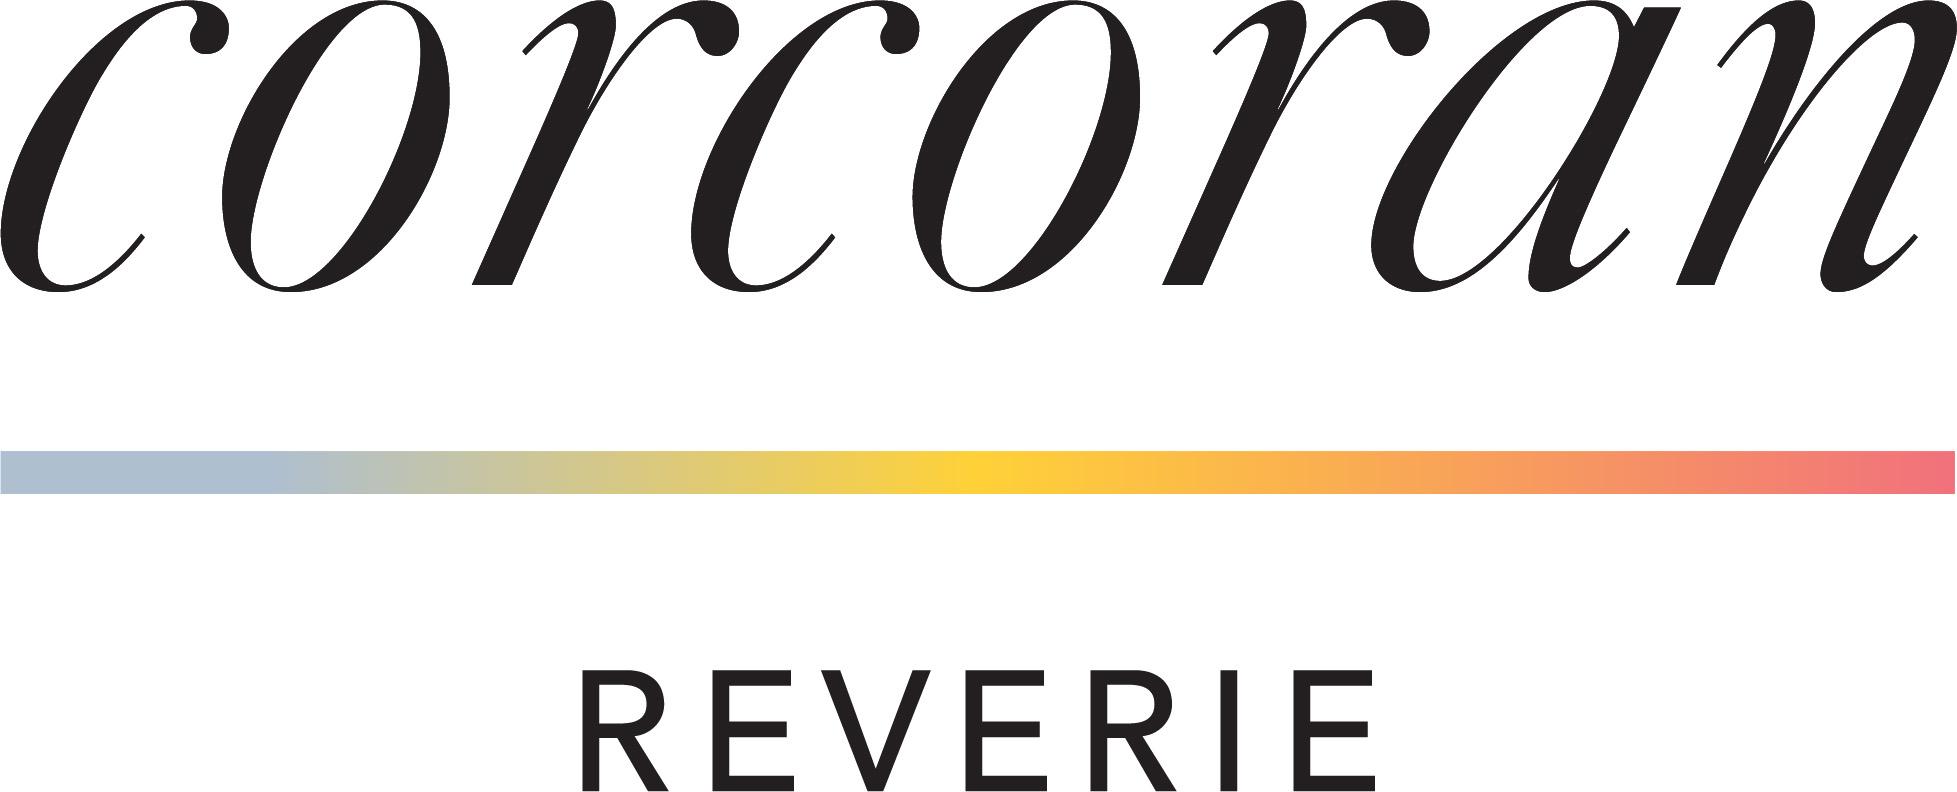 Corcoran Reverie